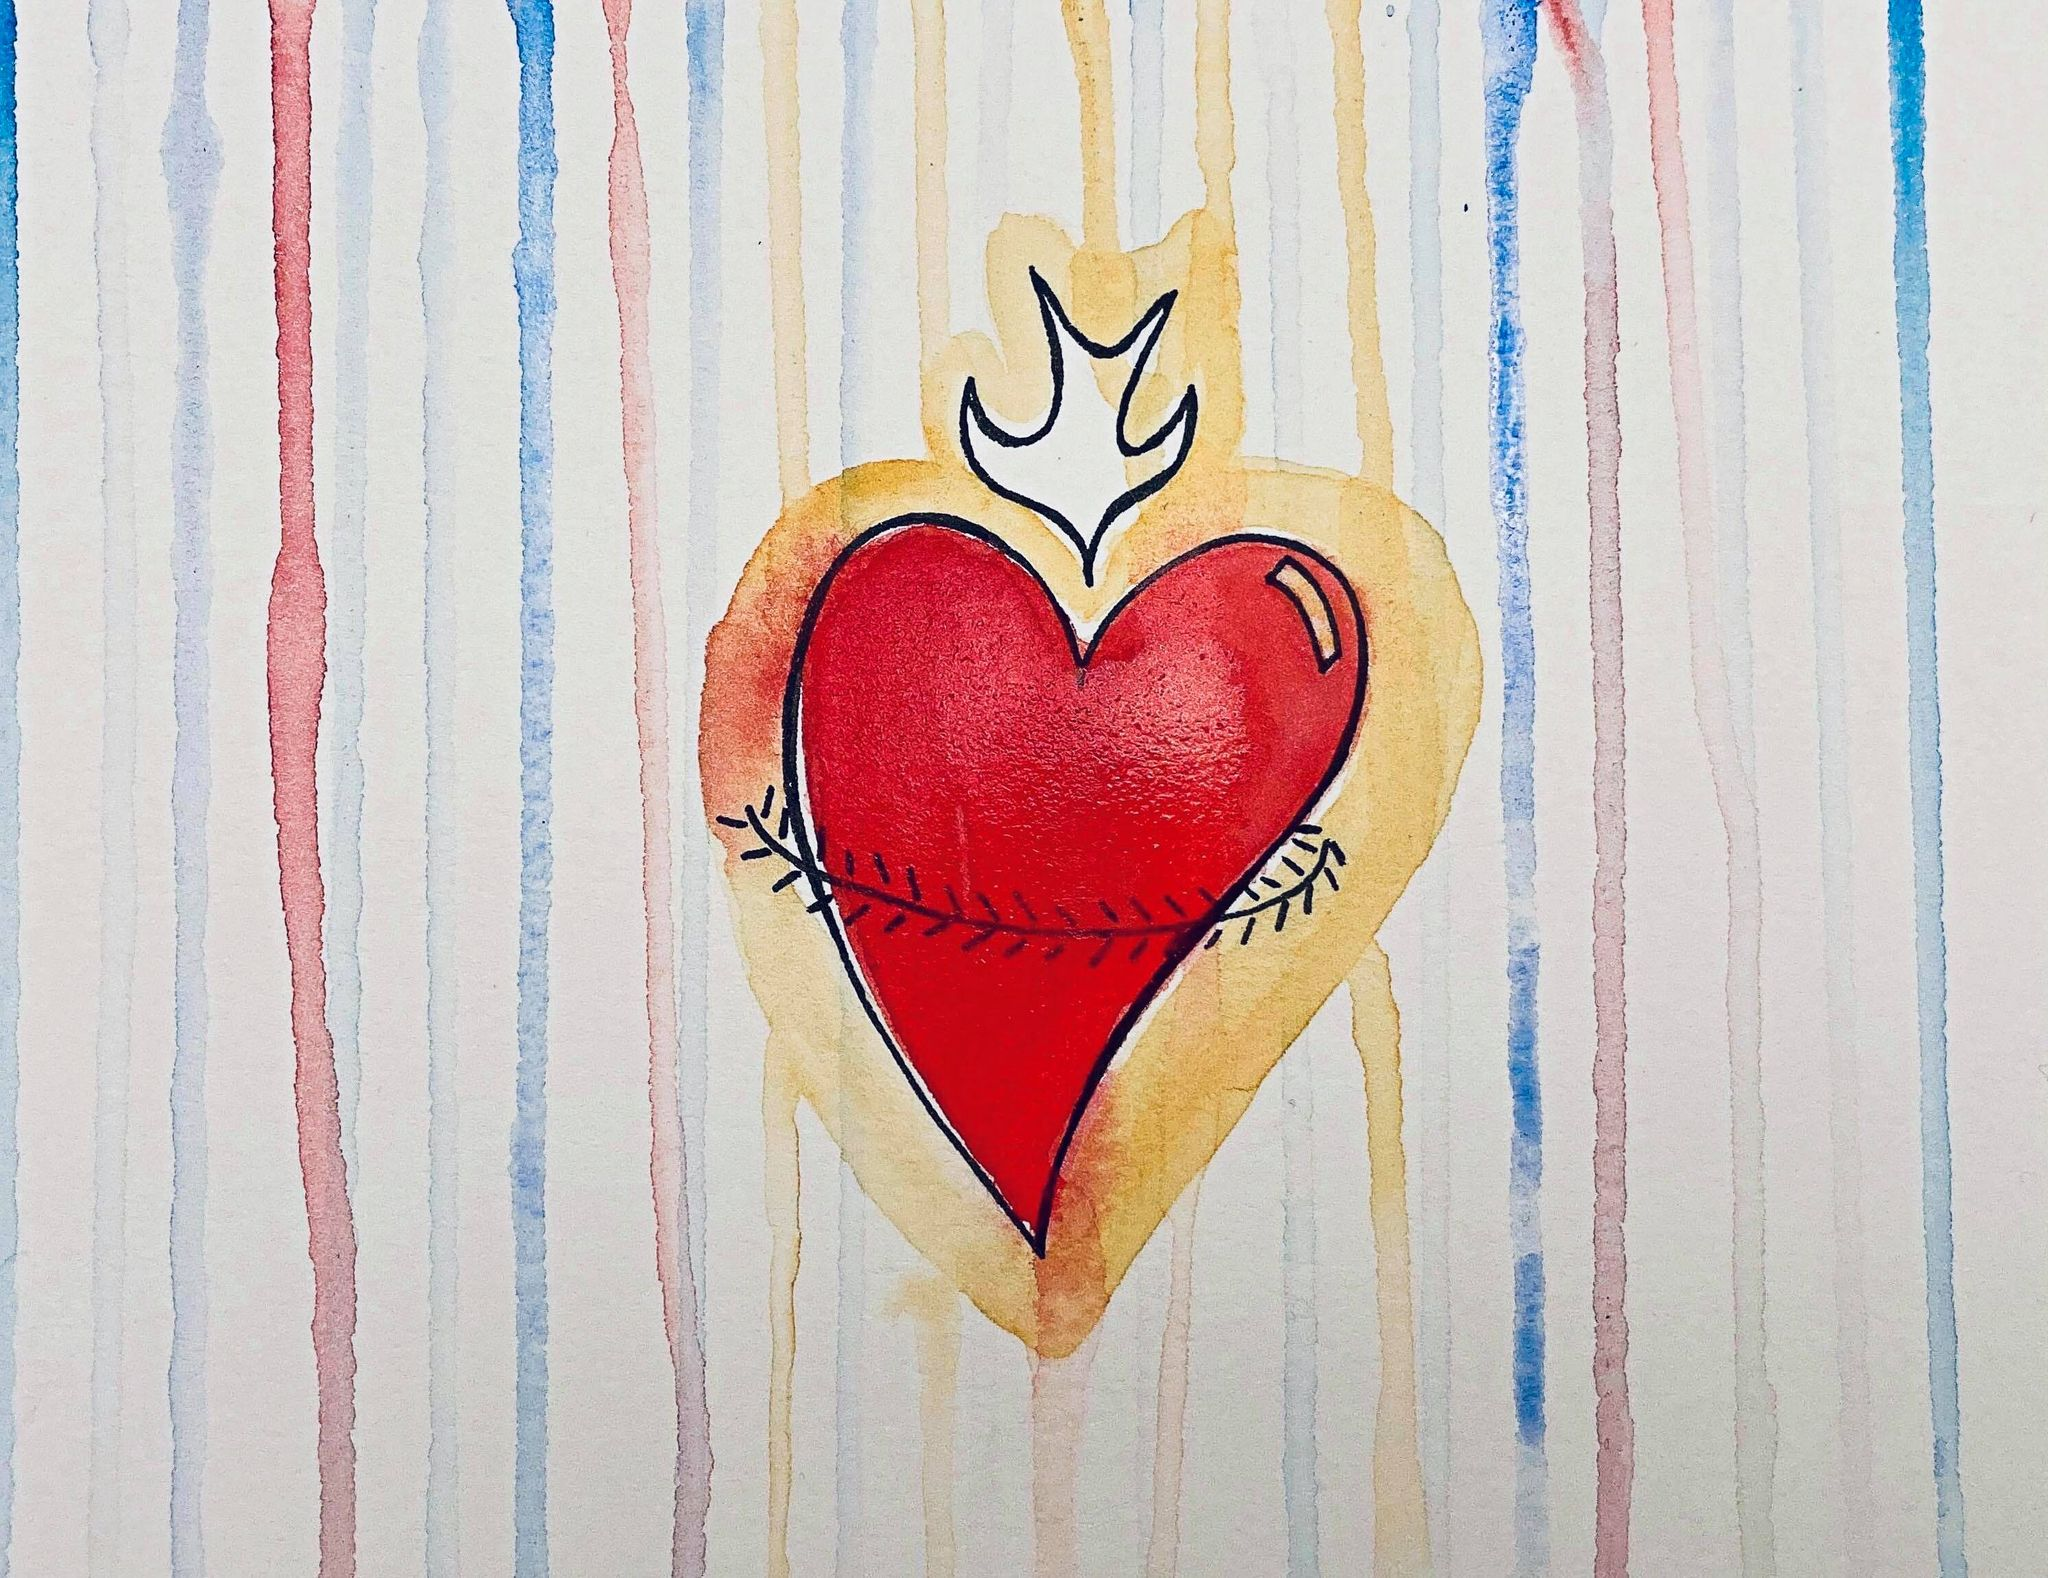 LGBTQ+ Catholics and the Sacred Heart of Jesus